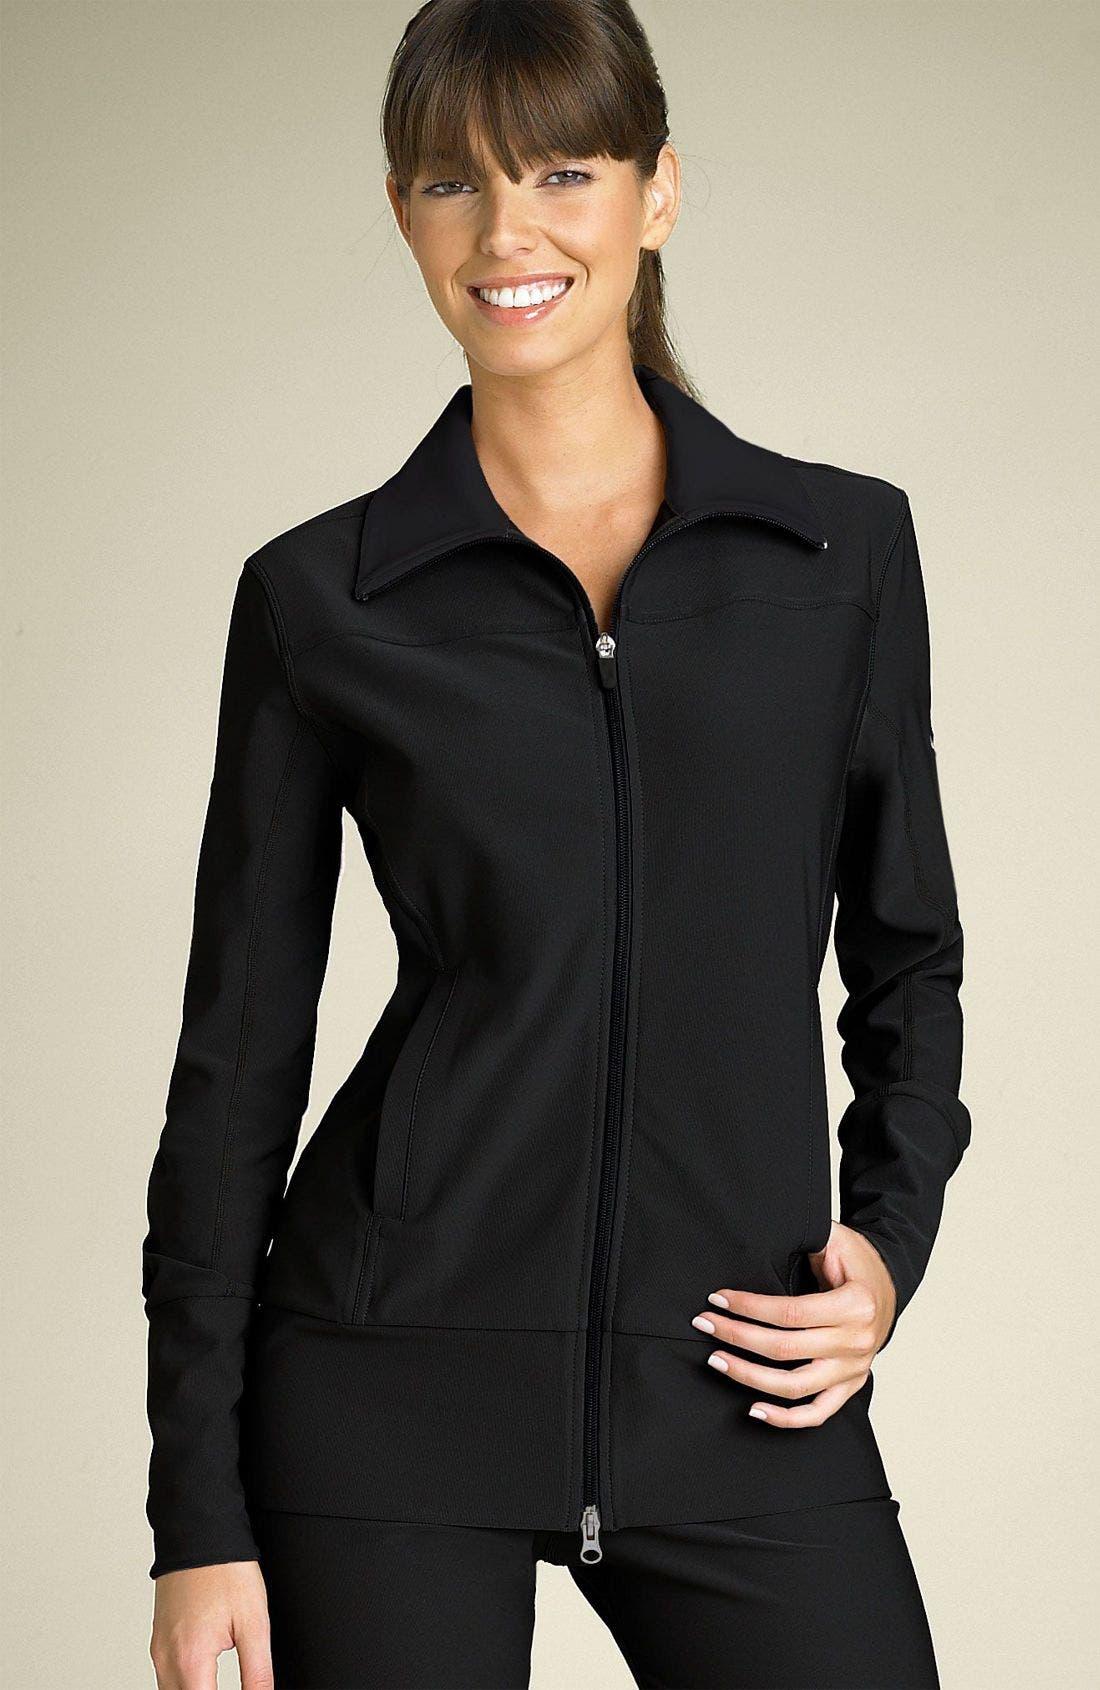 Alternate Image 1 Selected - Nike Modern Fit Jacket